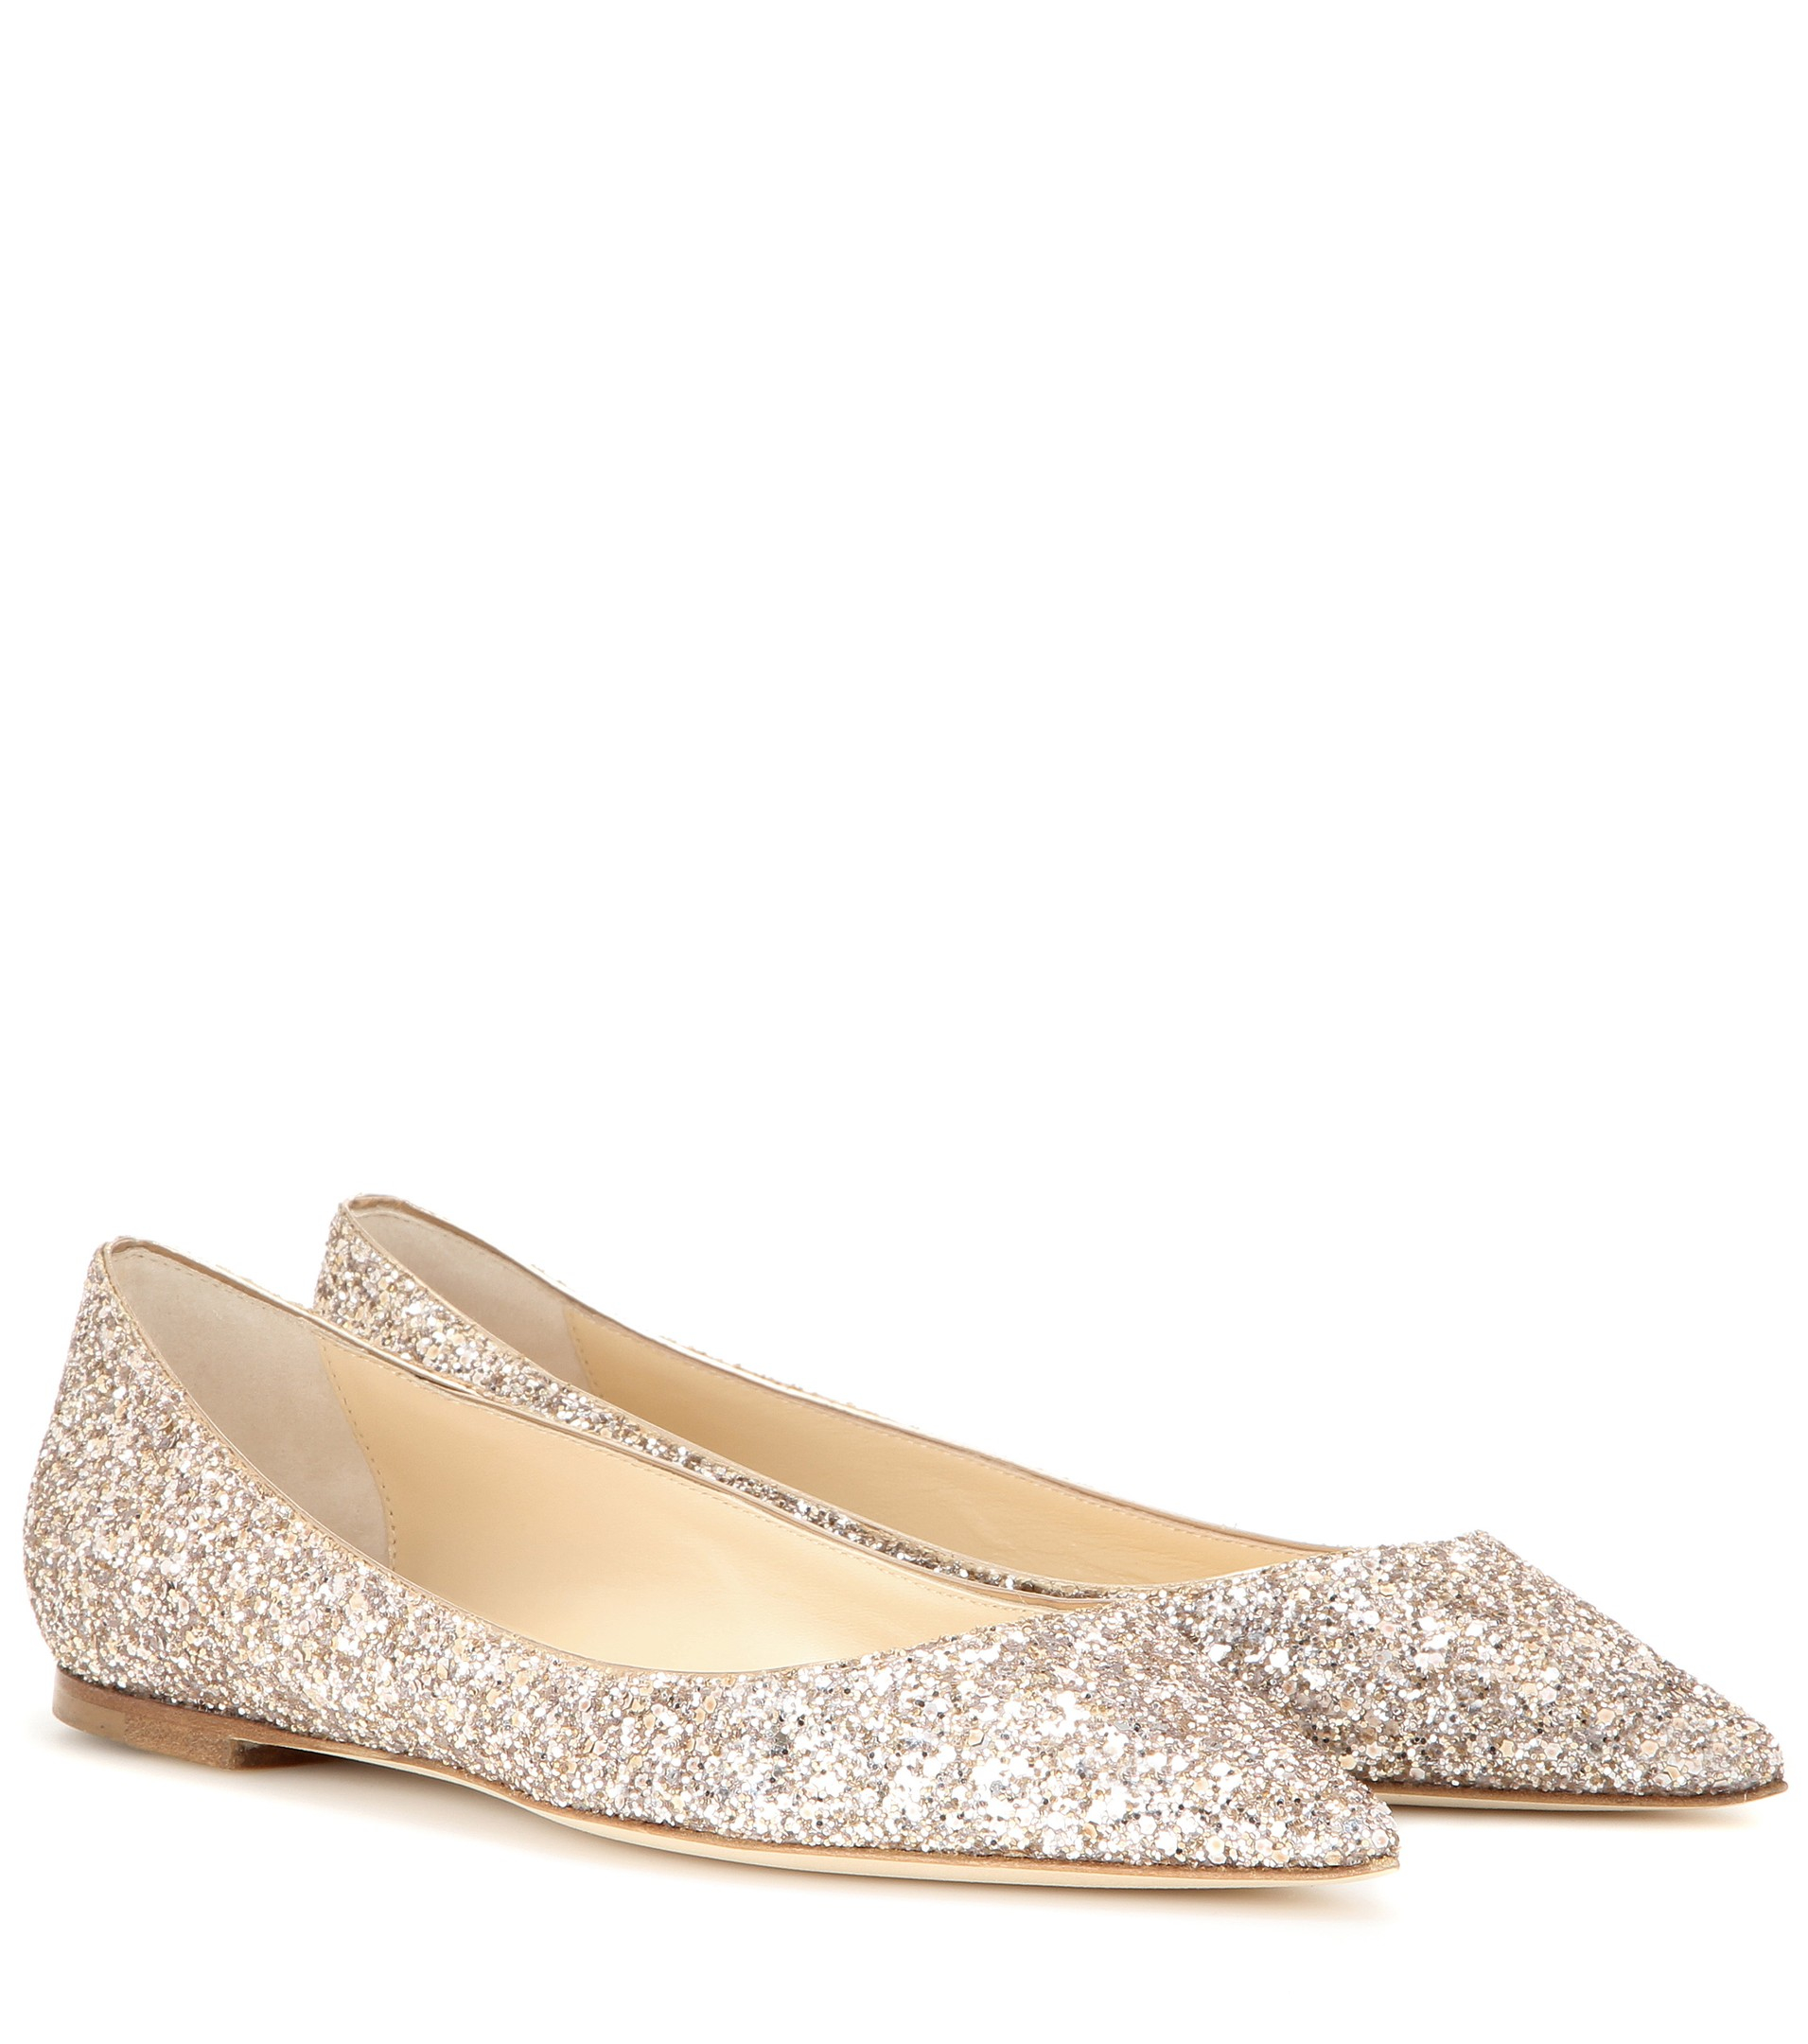 591400a2e81b ... france lyst jimmy choo alina glitter embellished flats in metallic  17caa 626f3